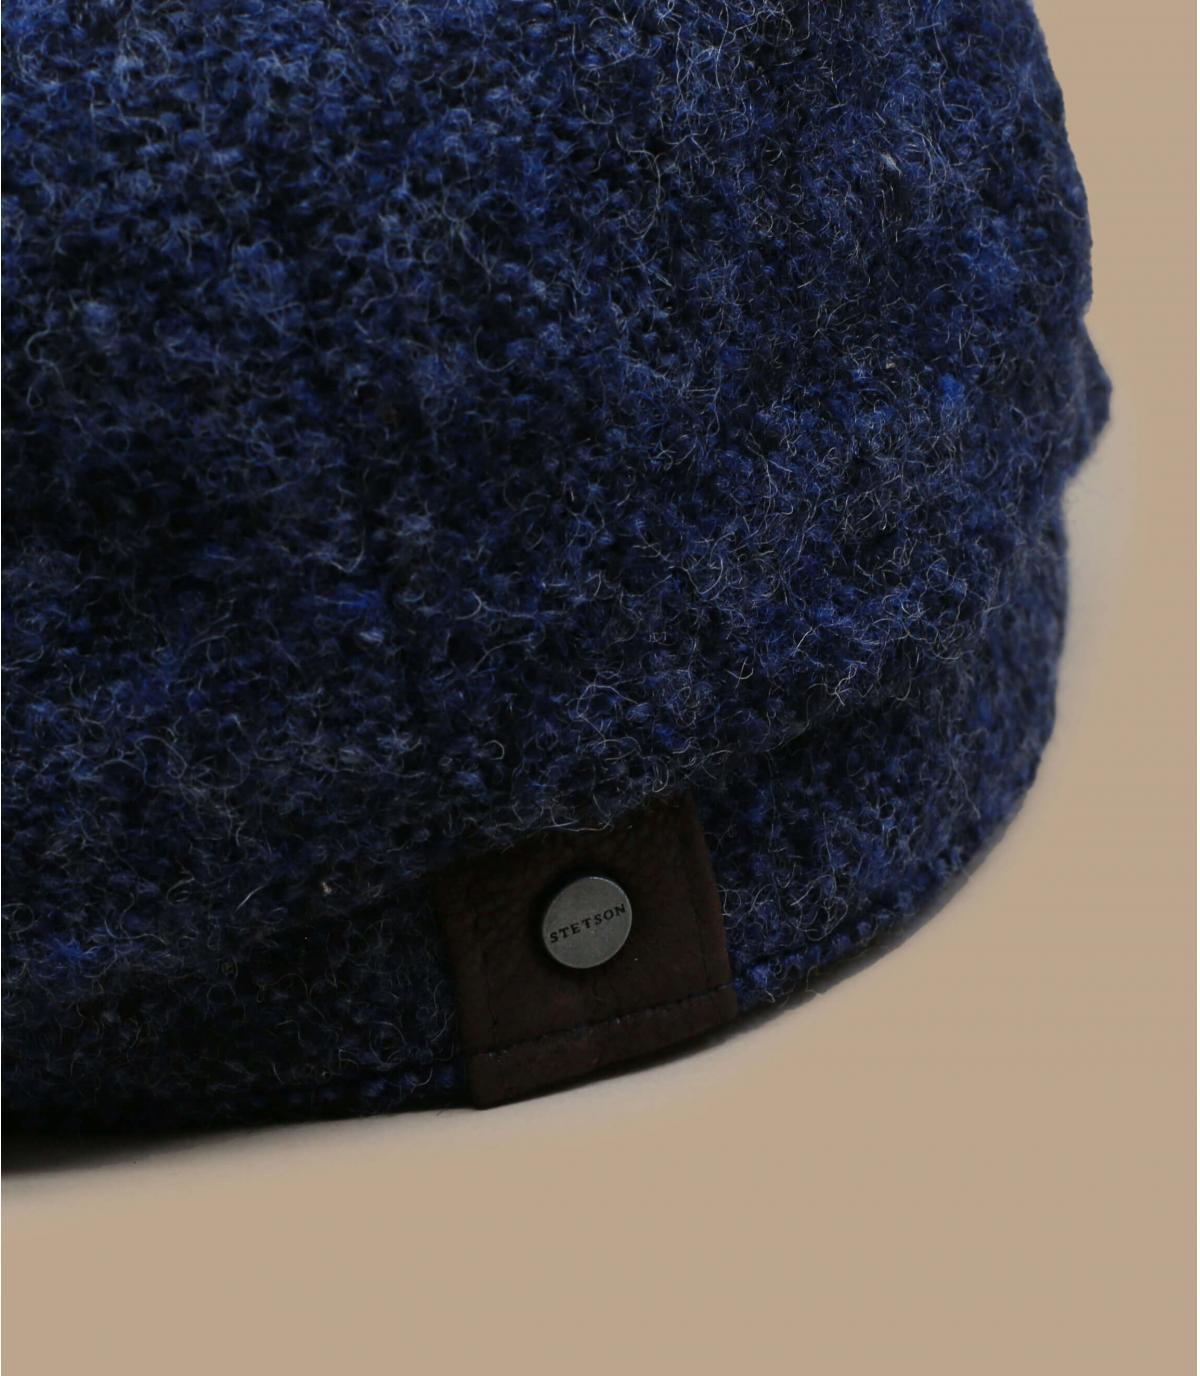 Details Hatteras Donegal navy blue - Abbildung 2